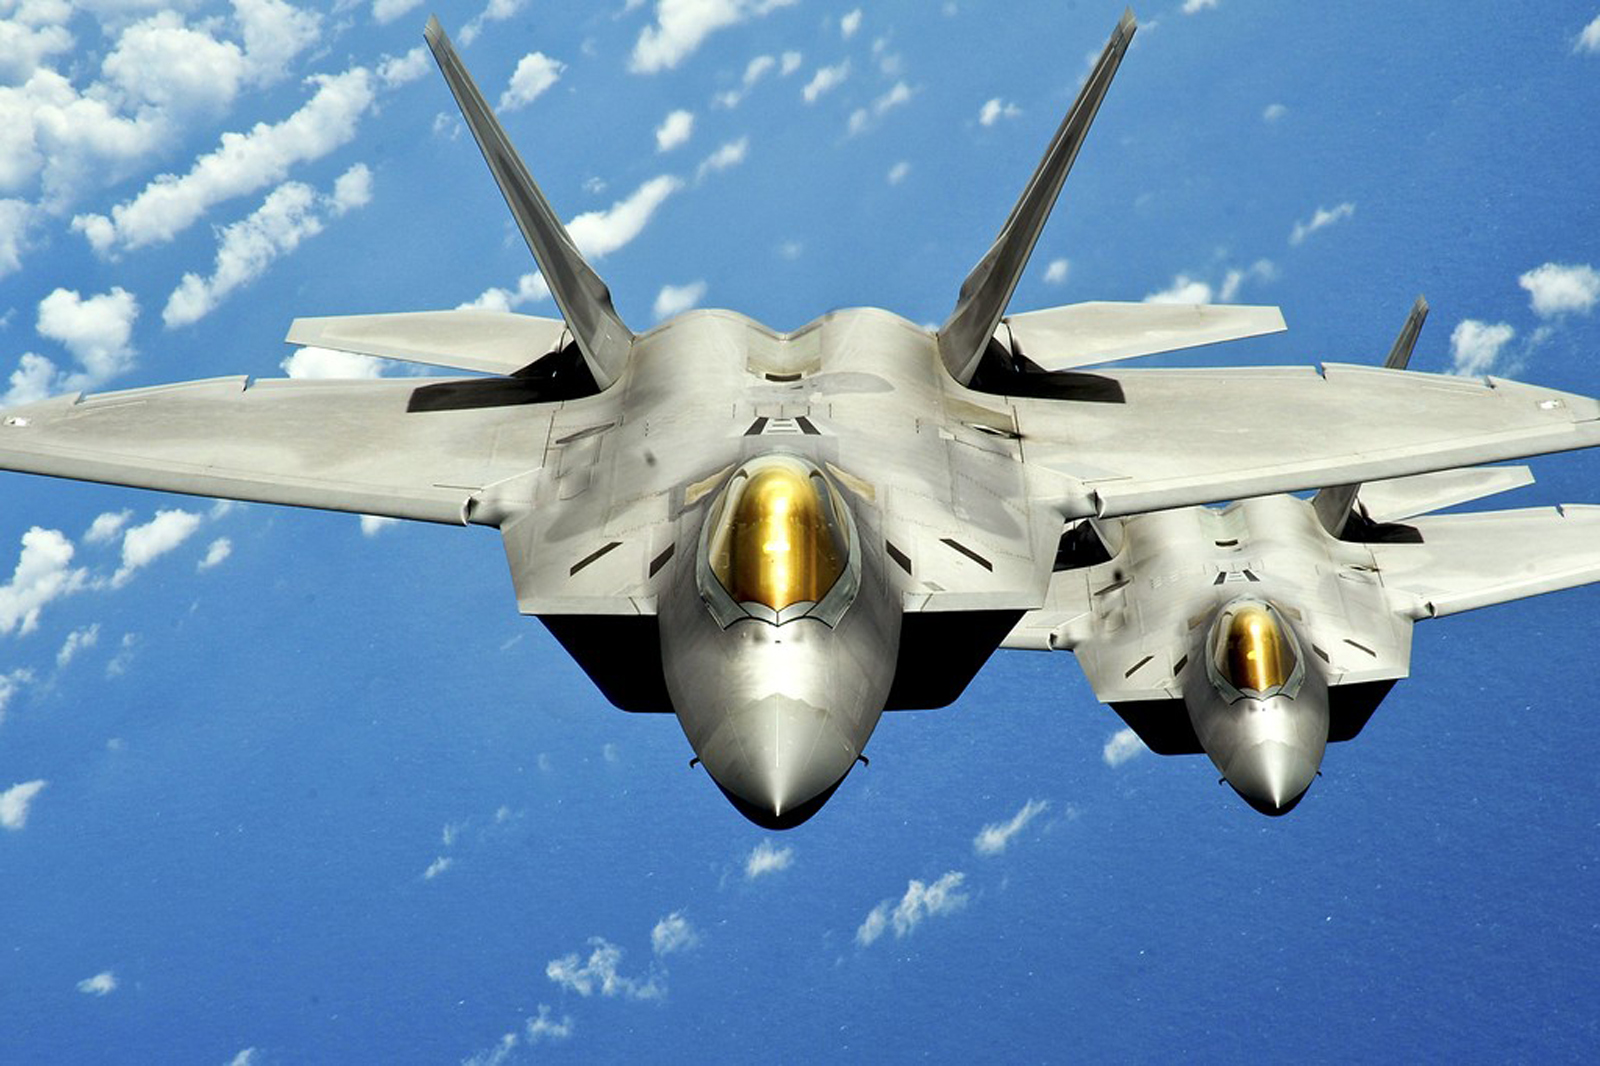 22 Raptor Jet Fighter HD Wallpapers Download Wallpapers in HD 1600x1066